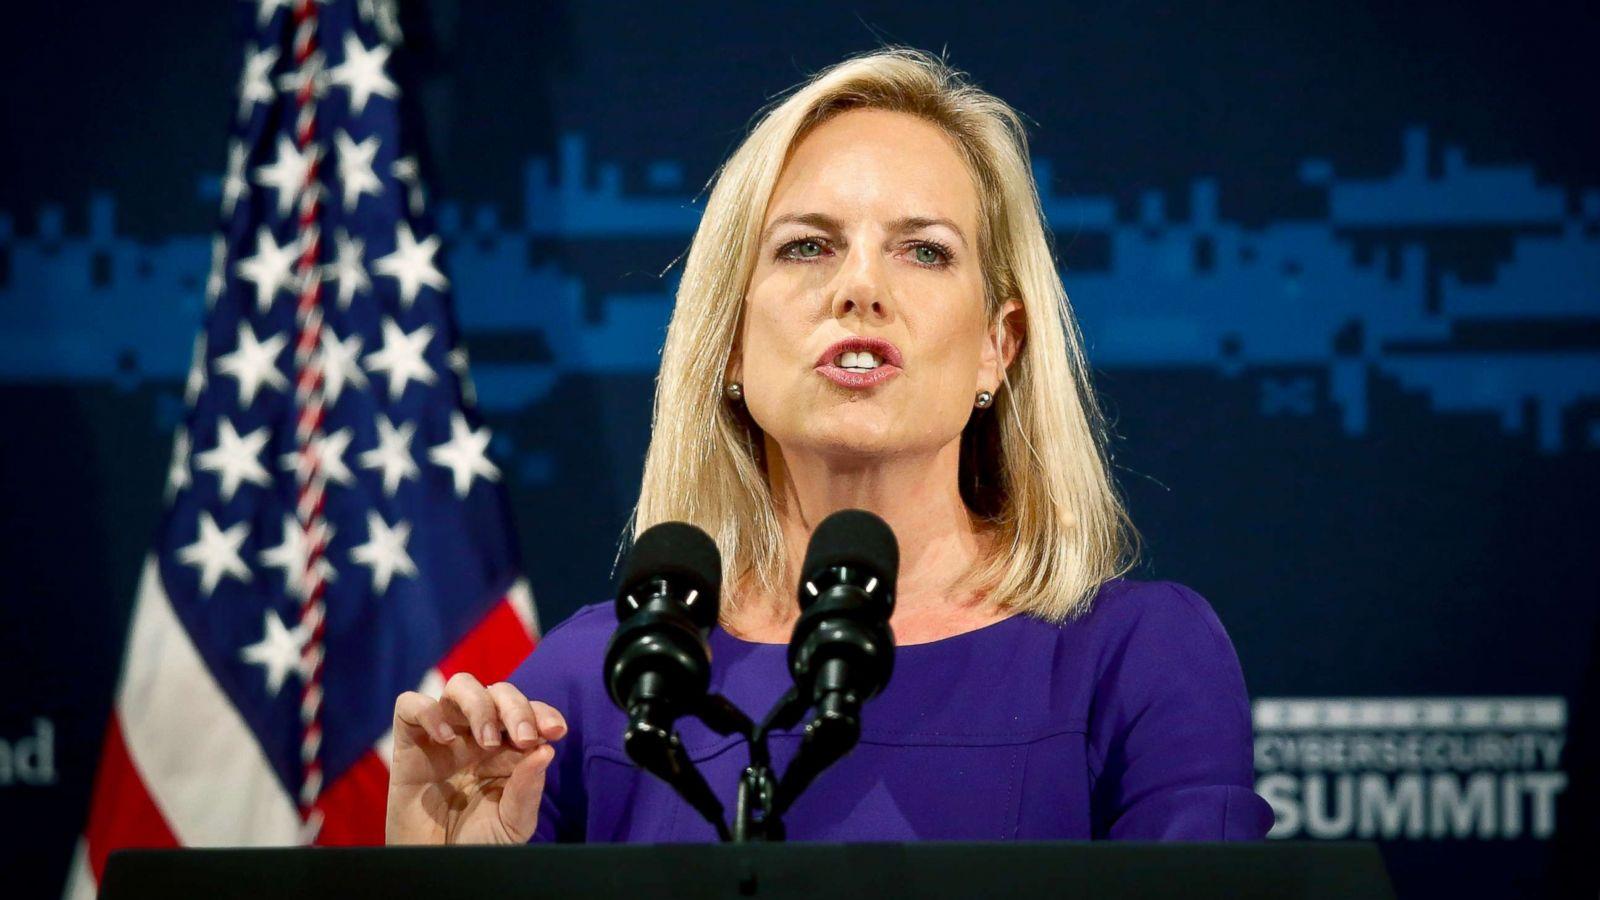 abcnews.go.com - Katherine Faulders, John Santucci and Tara Palmeri - Trump planning shakeup, eyeing new chief of staff and DHS secretary: Sources